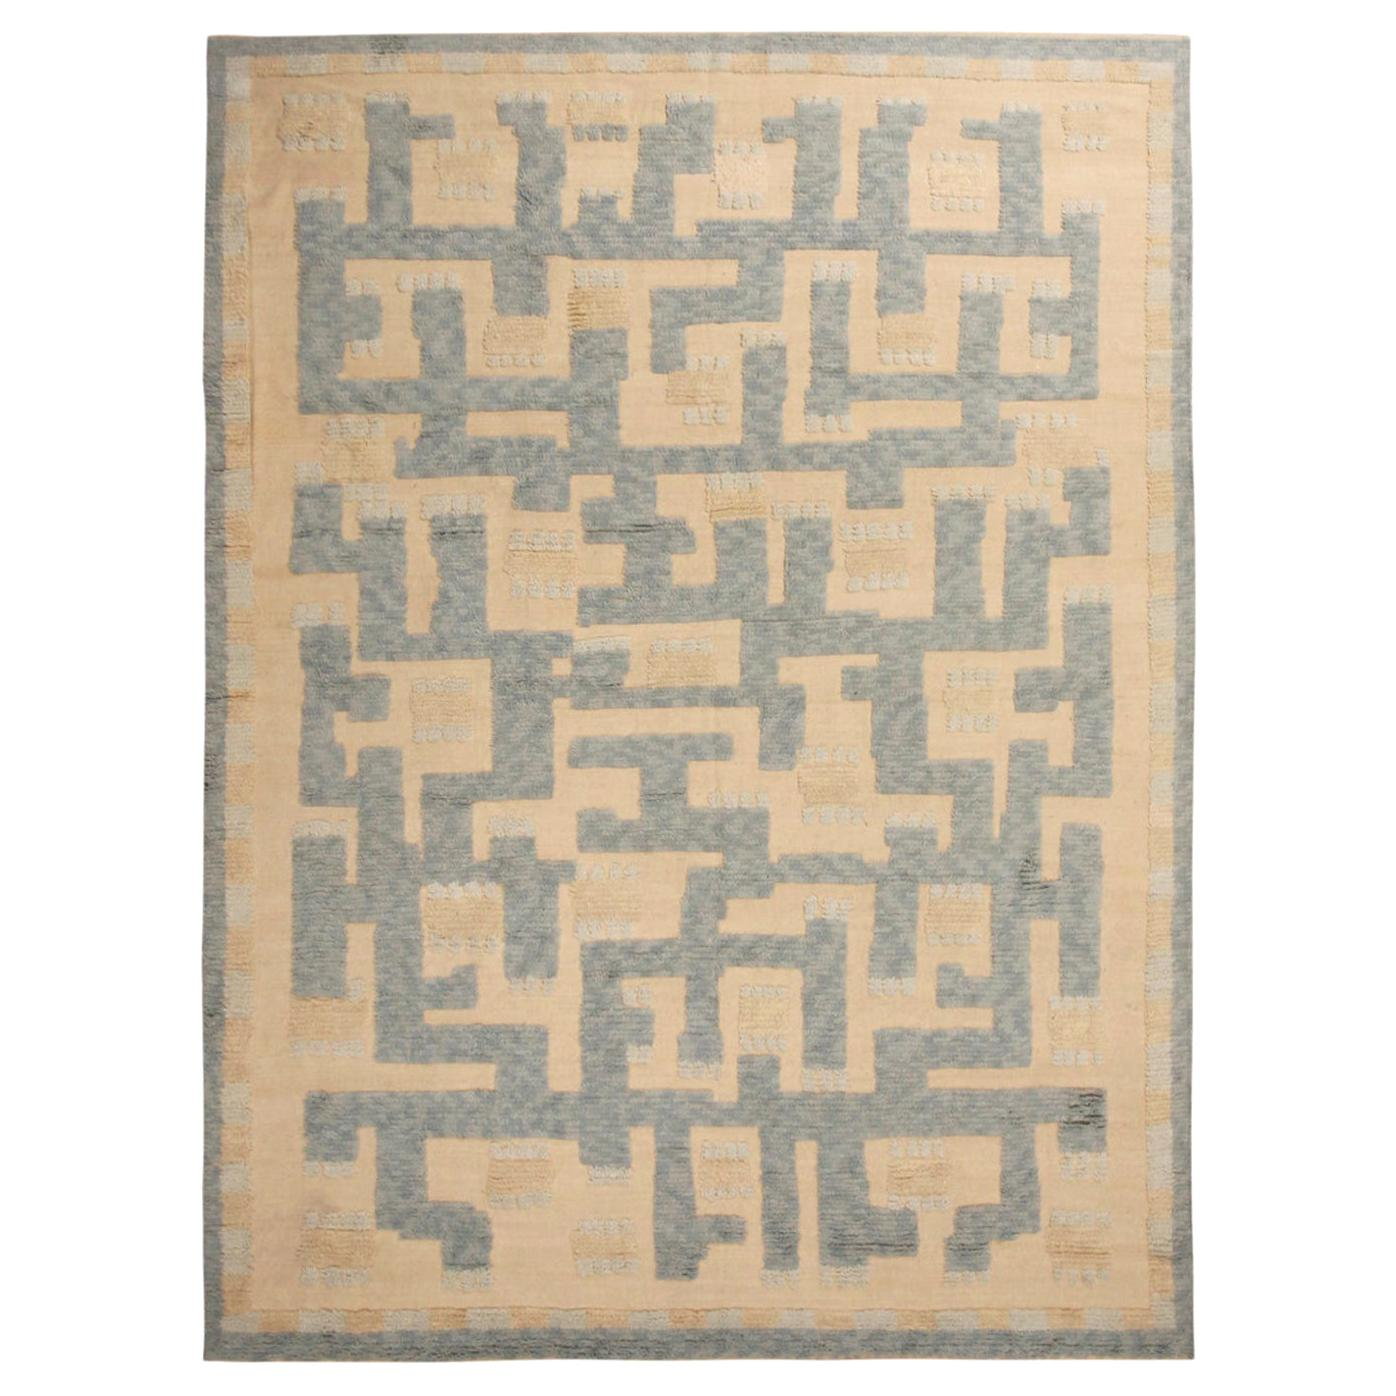 Rug & Kilim's Scandinavian-Inspired Geometric Beige and Blue Wool Pile Rug